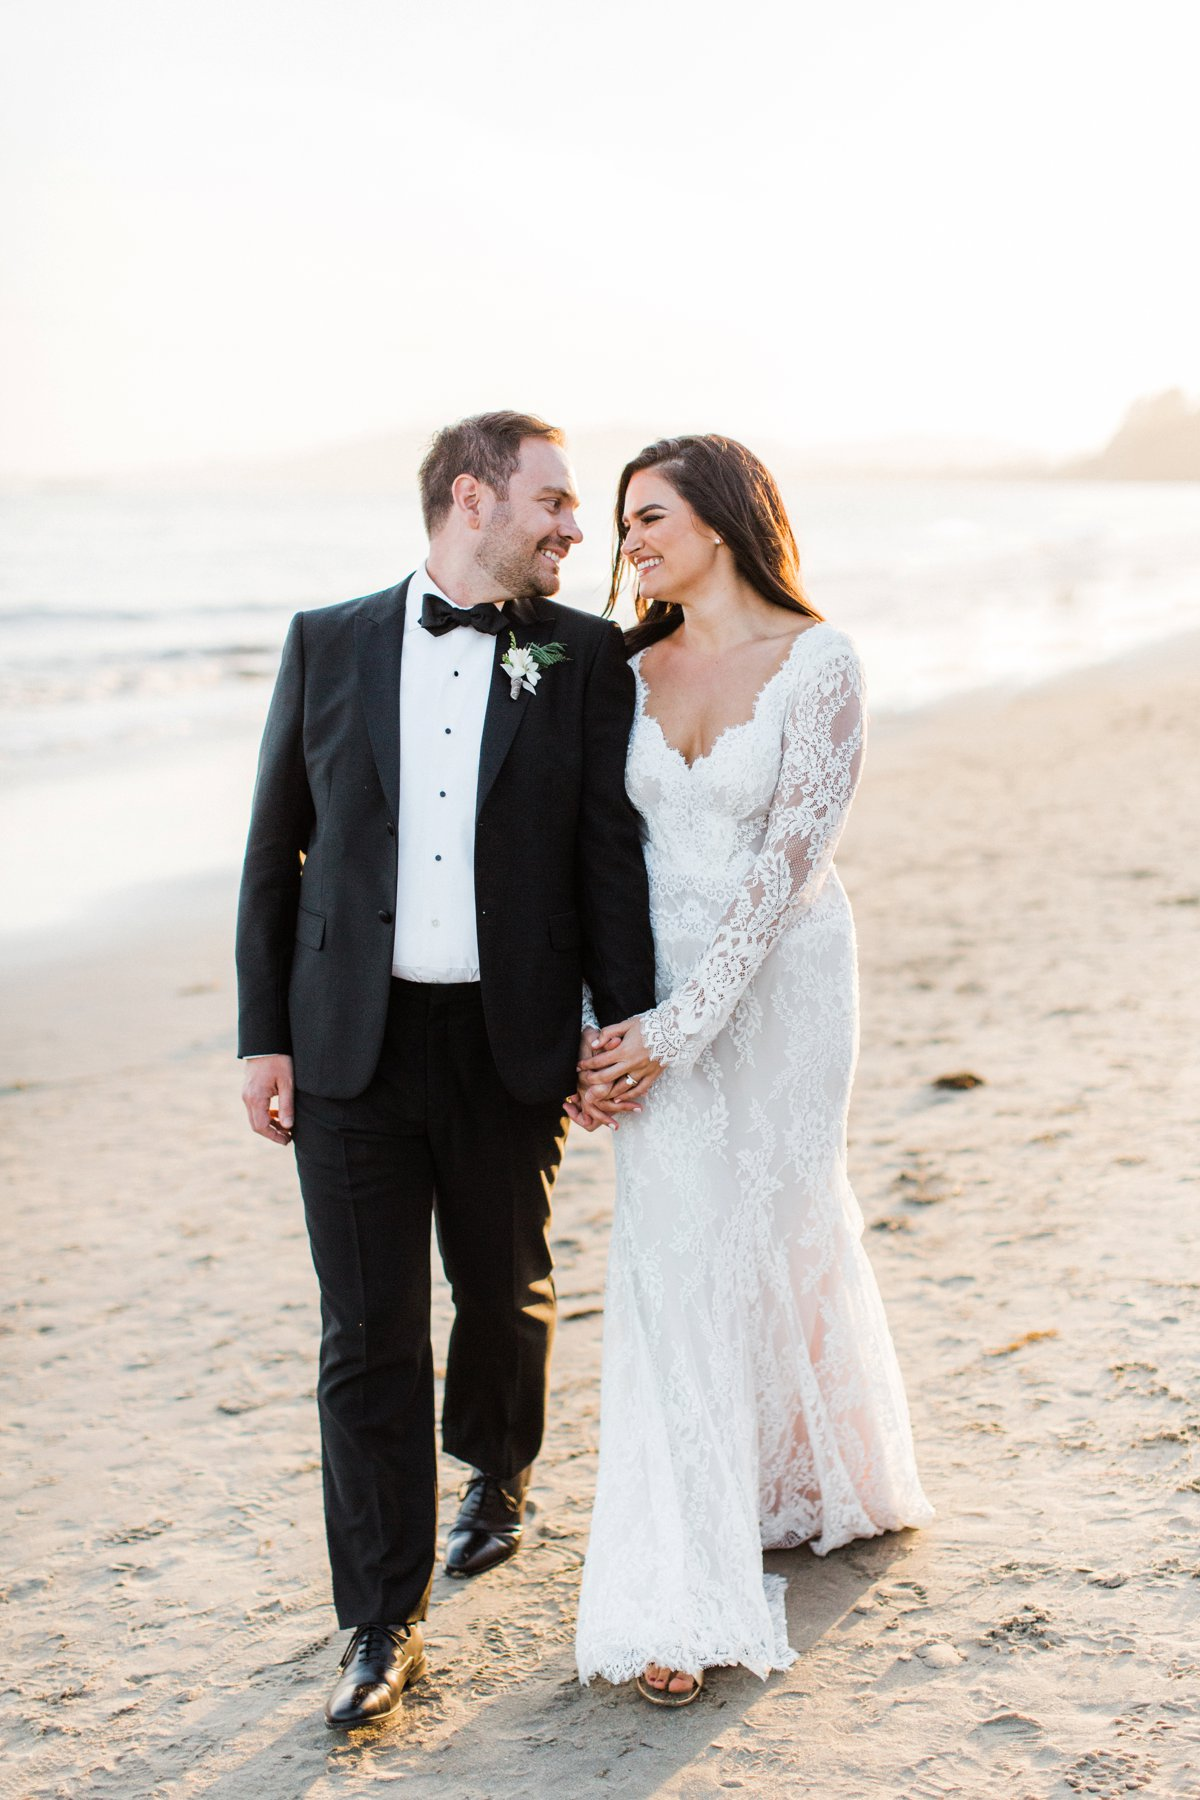 black tie beach weddings - photo by Anna Delores http://ruffledblog.com/chic-modern-wedding-at-four-seasons-santa-barbara